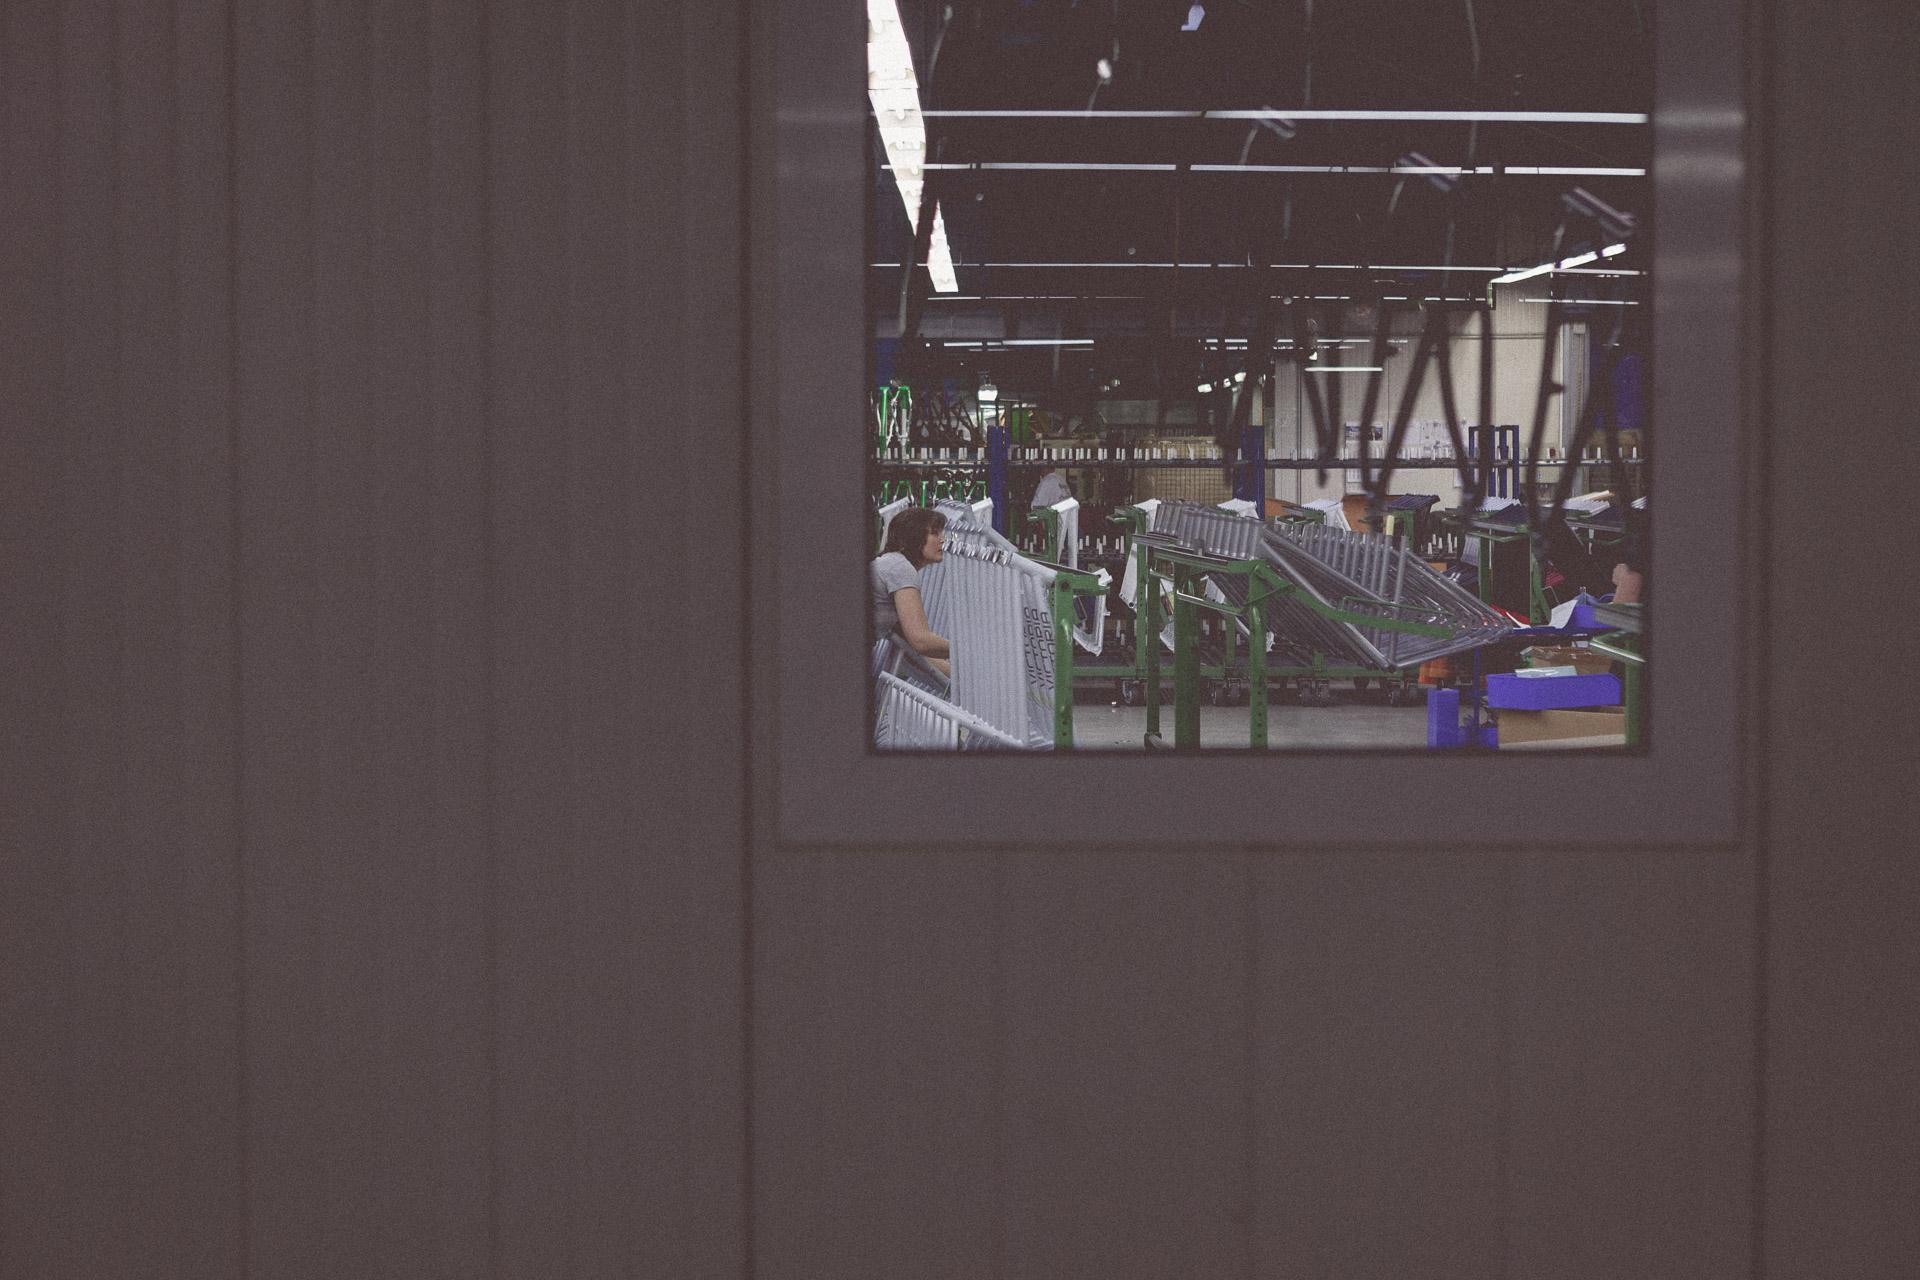 01-Derby-Cycle-Werke-Fahrradproduktion